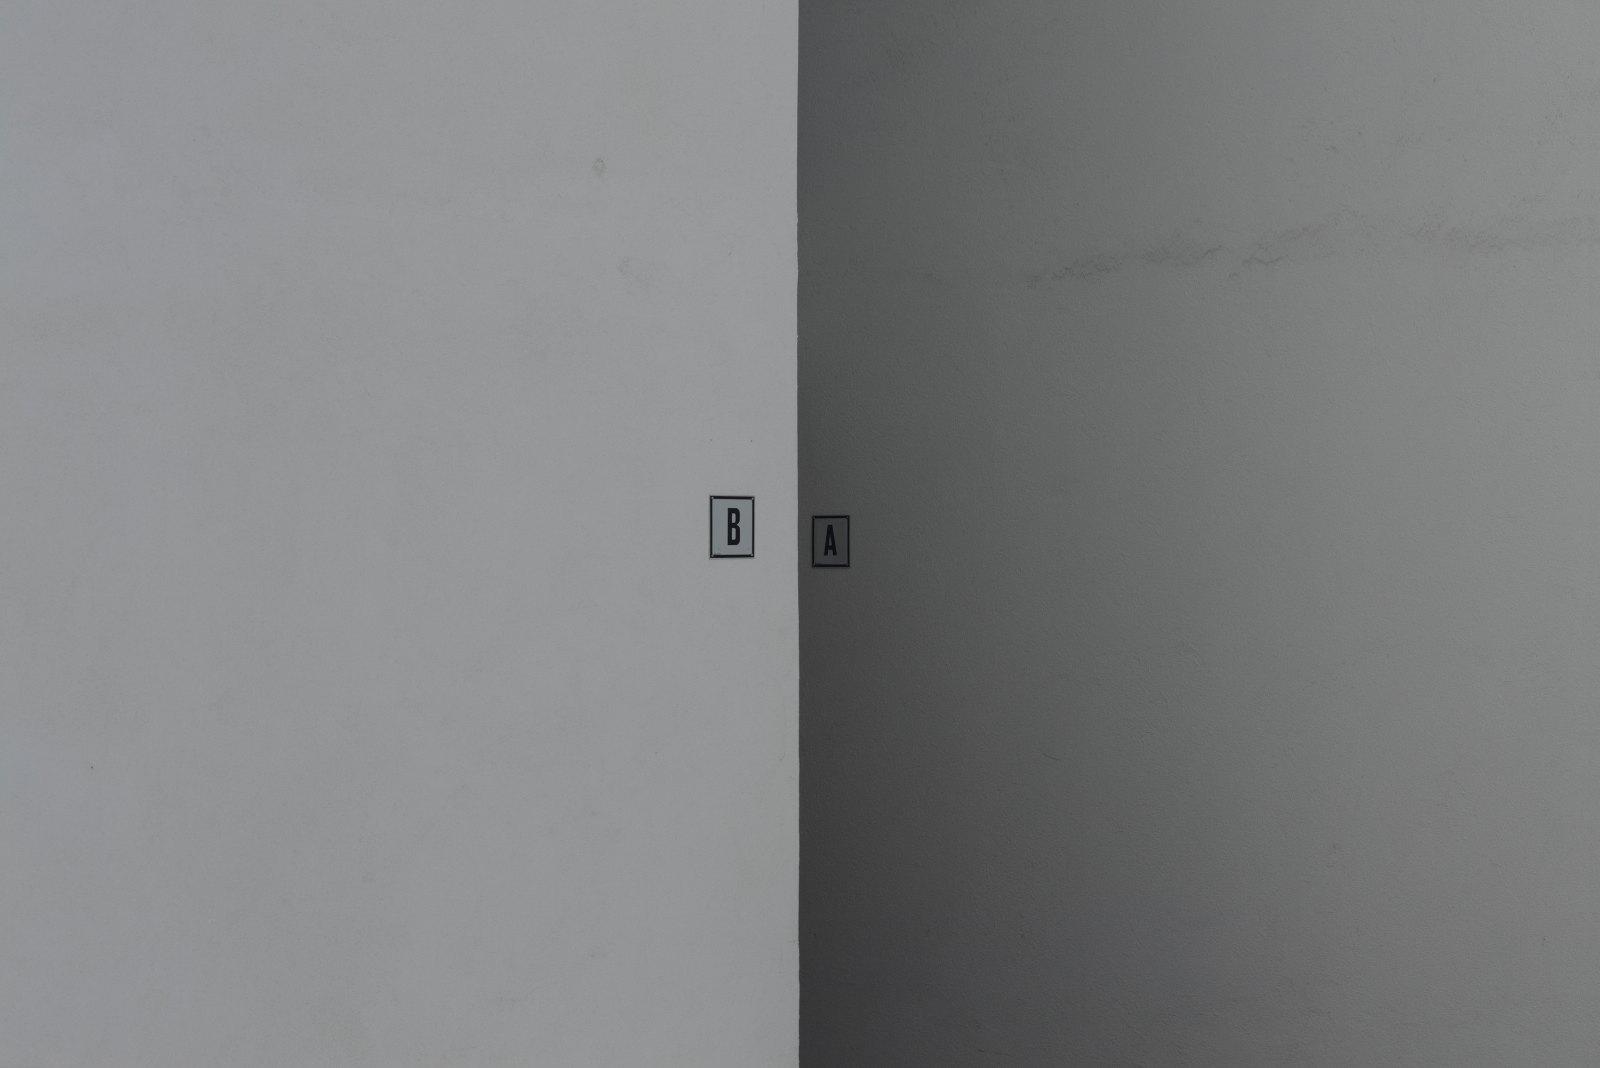 A follows b, 2010, giclée print, aluminium, 124,2 x 185,2 cm